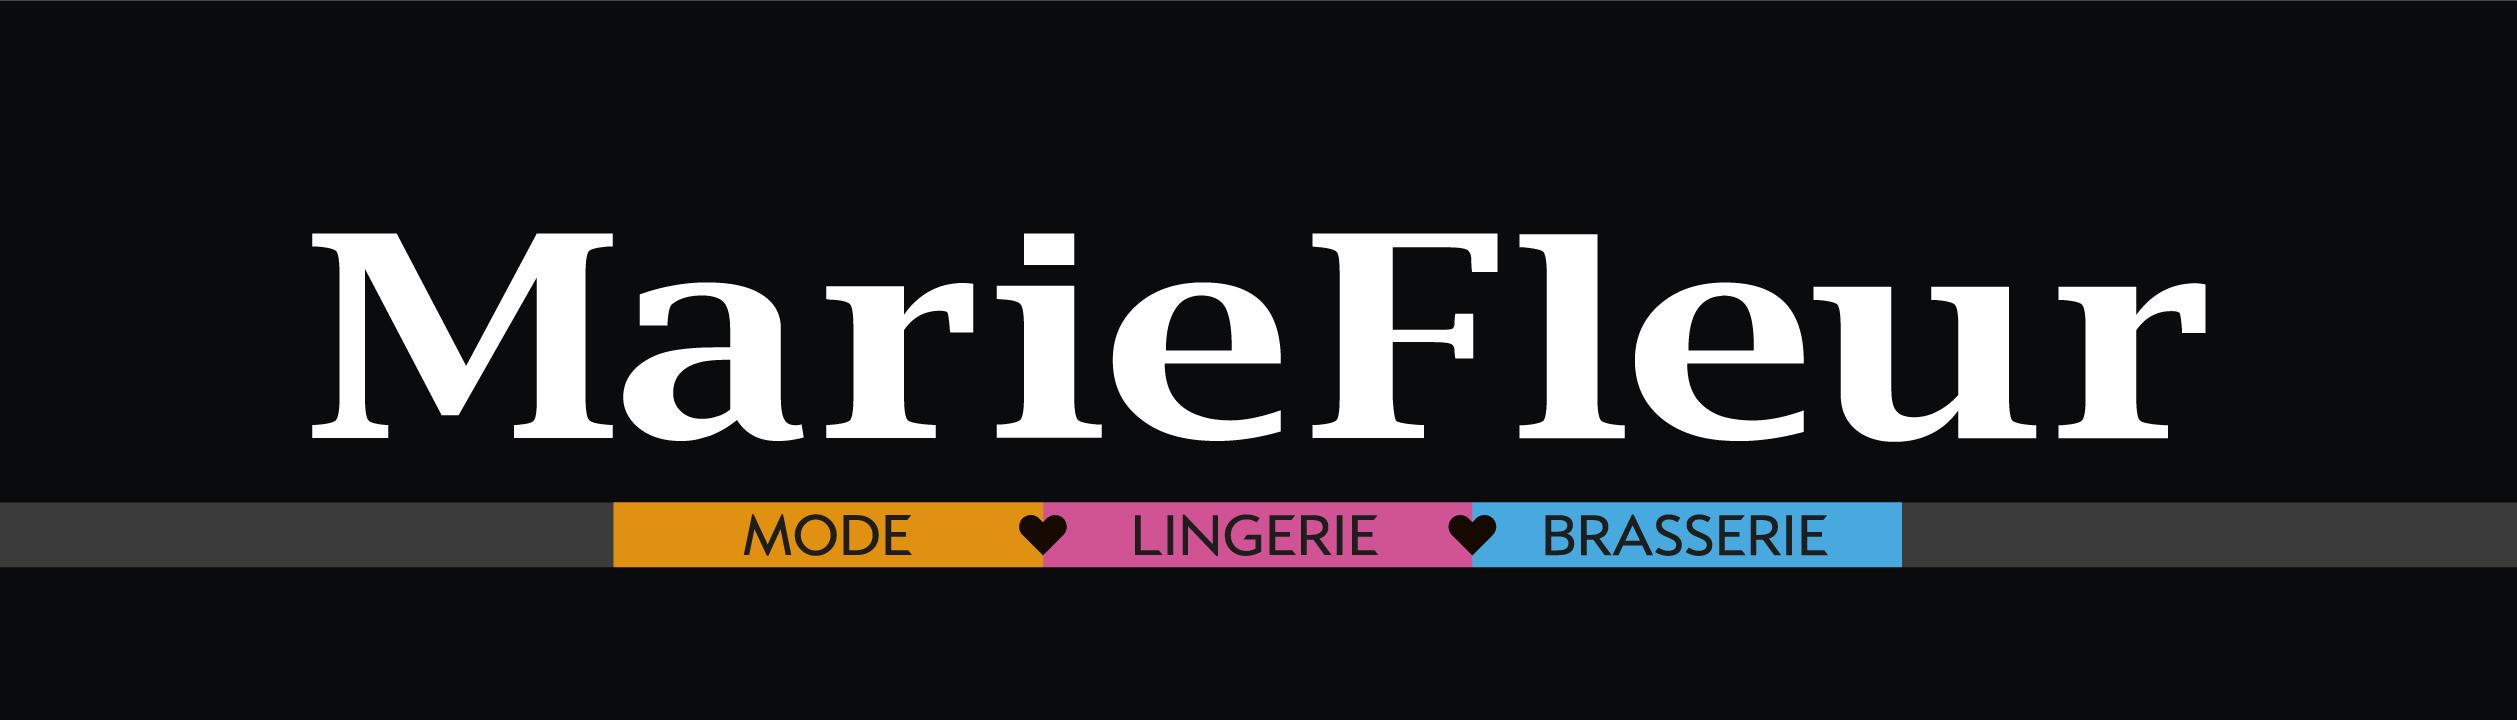 Marie Fleur - Mode, lingerie en brasserie